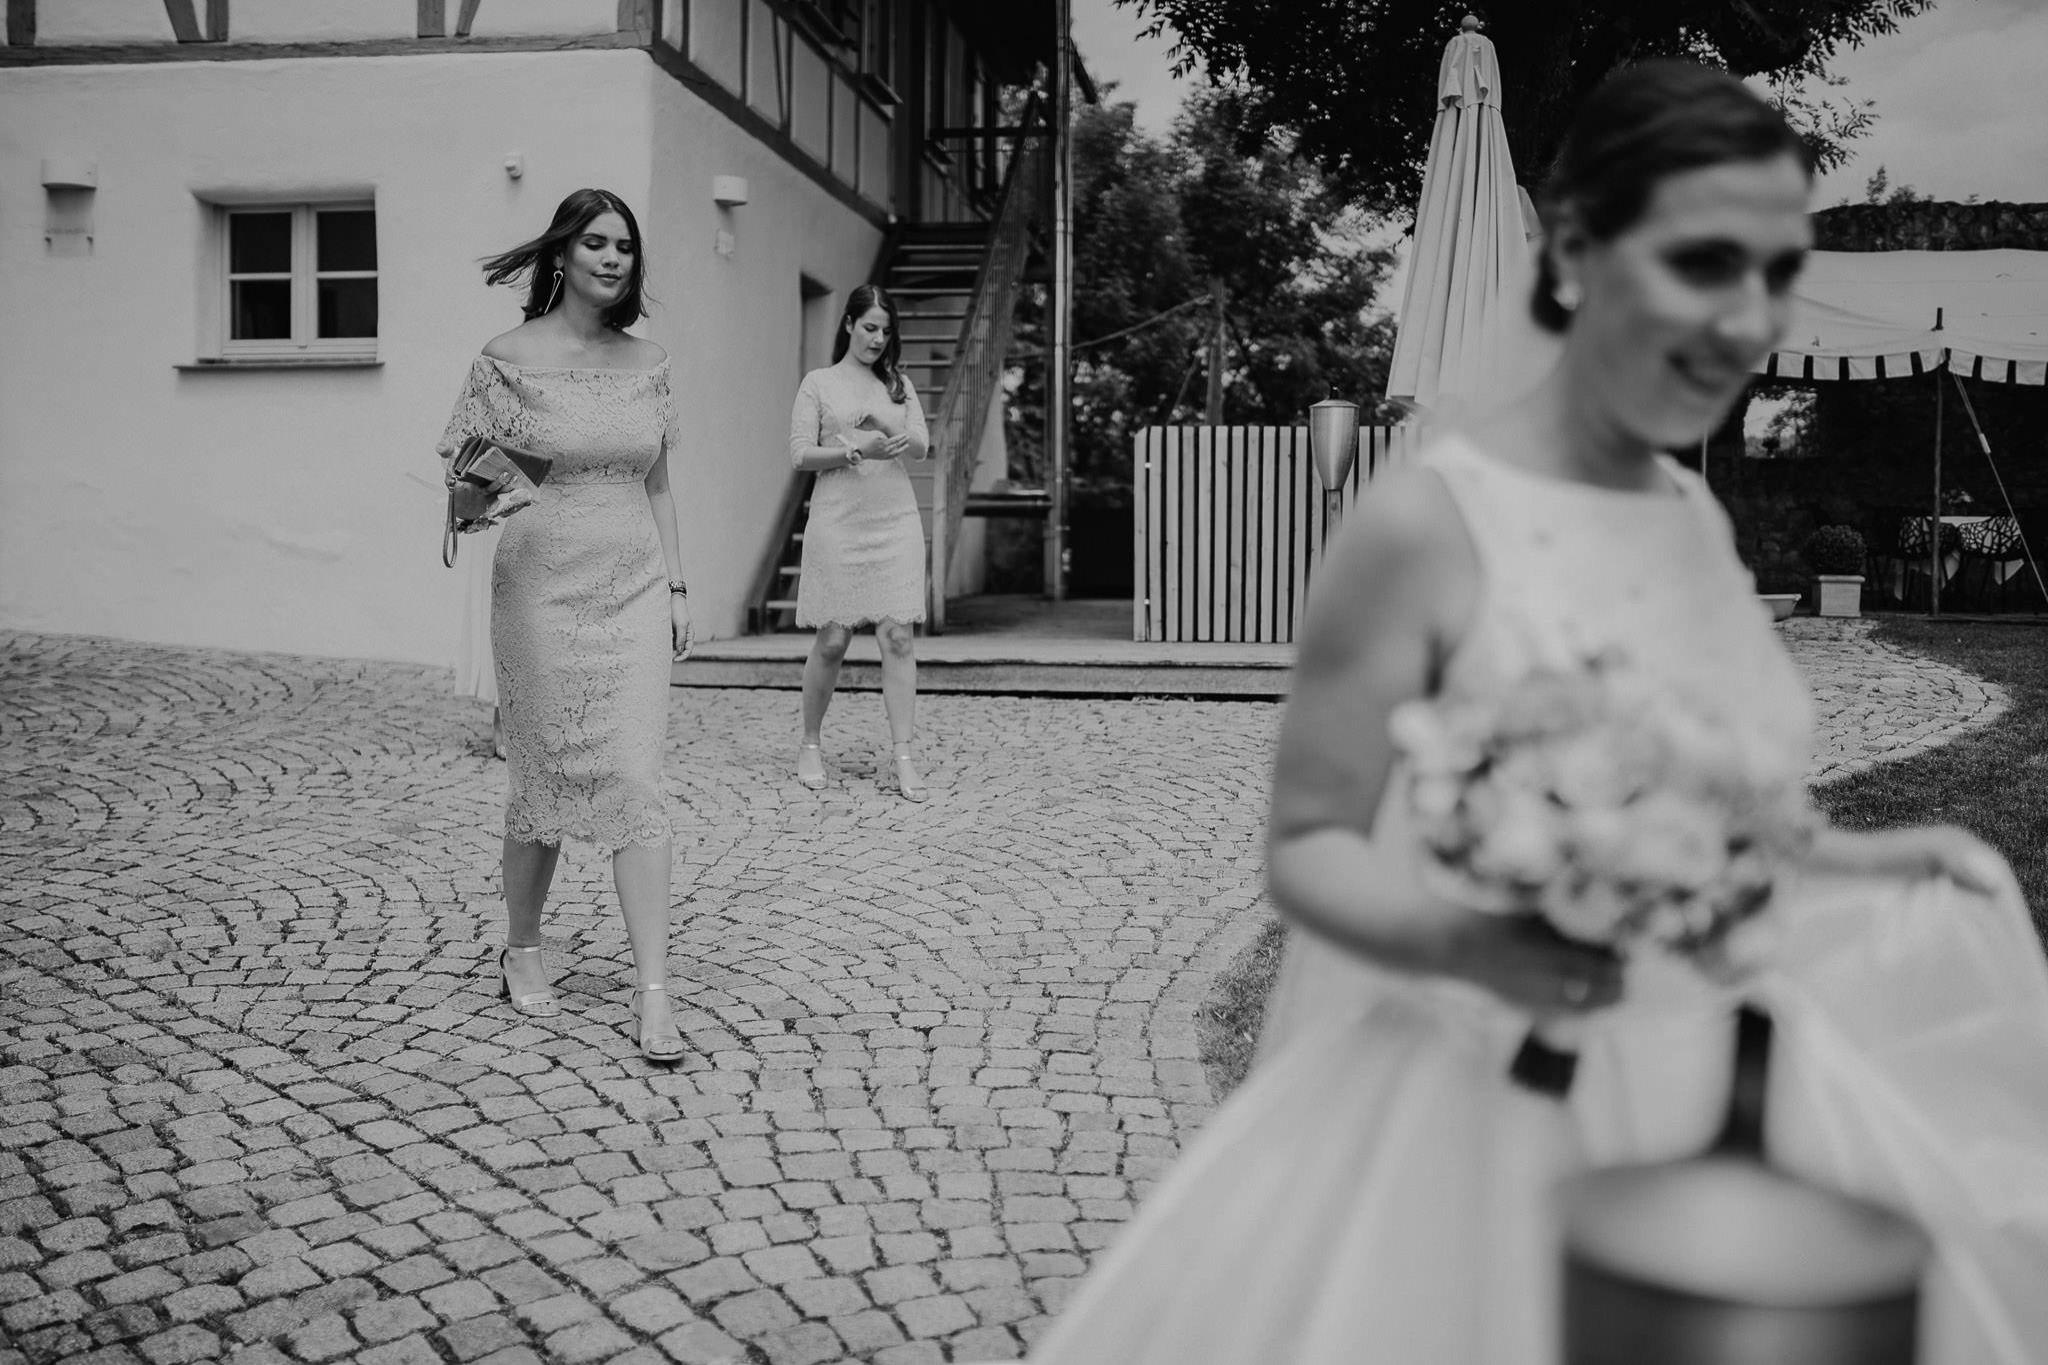 wedding photographer hamilton new zealand 1028 2